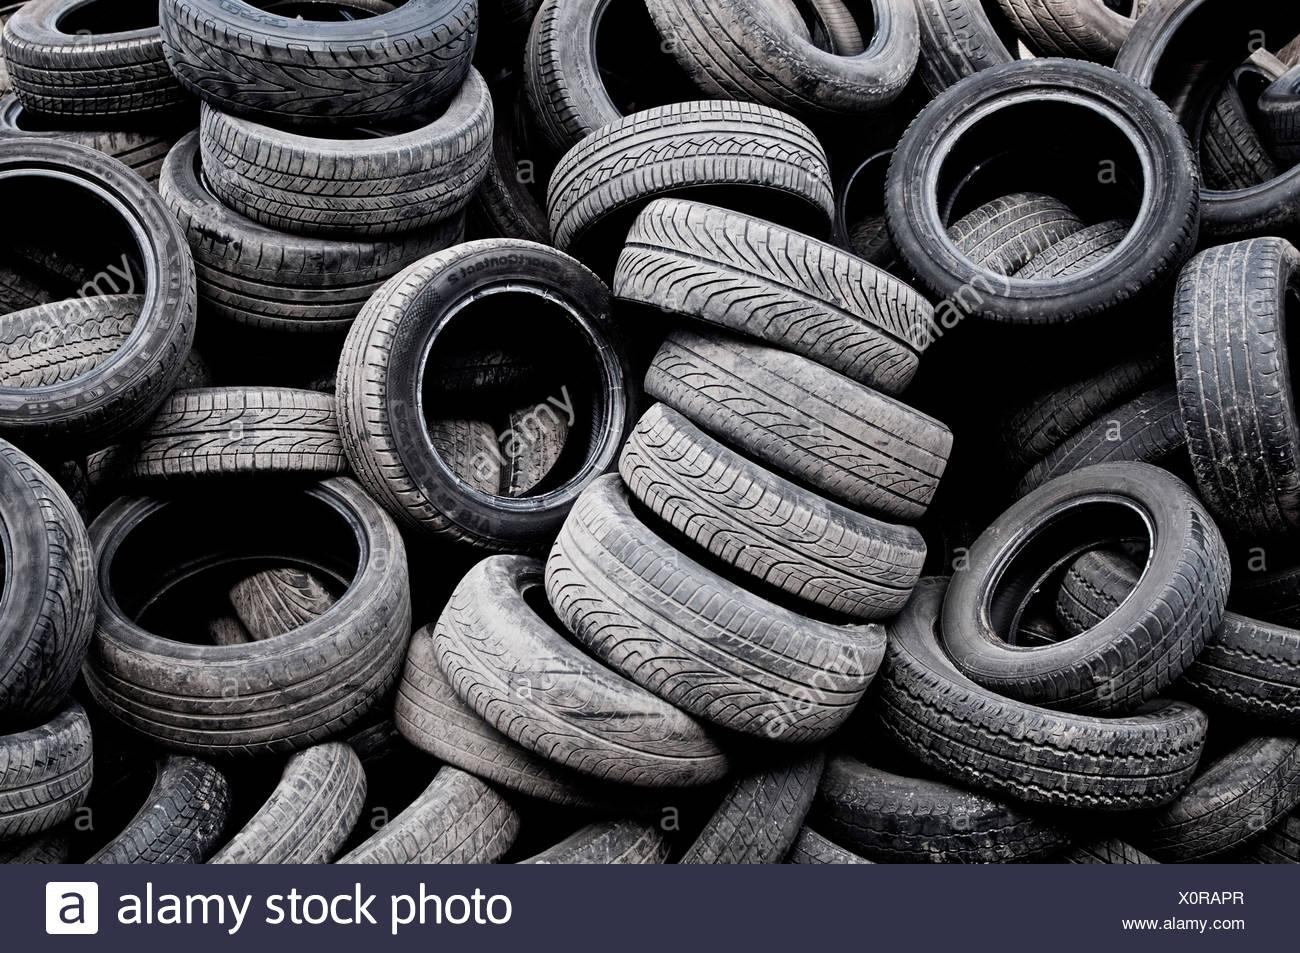 Un mucchio di pneumatici usati Immagini Stock